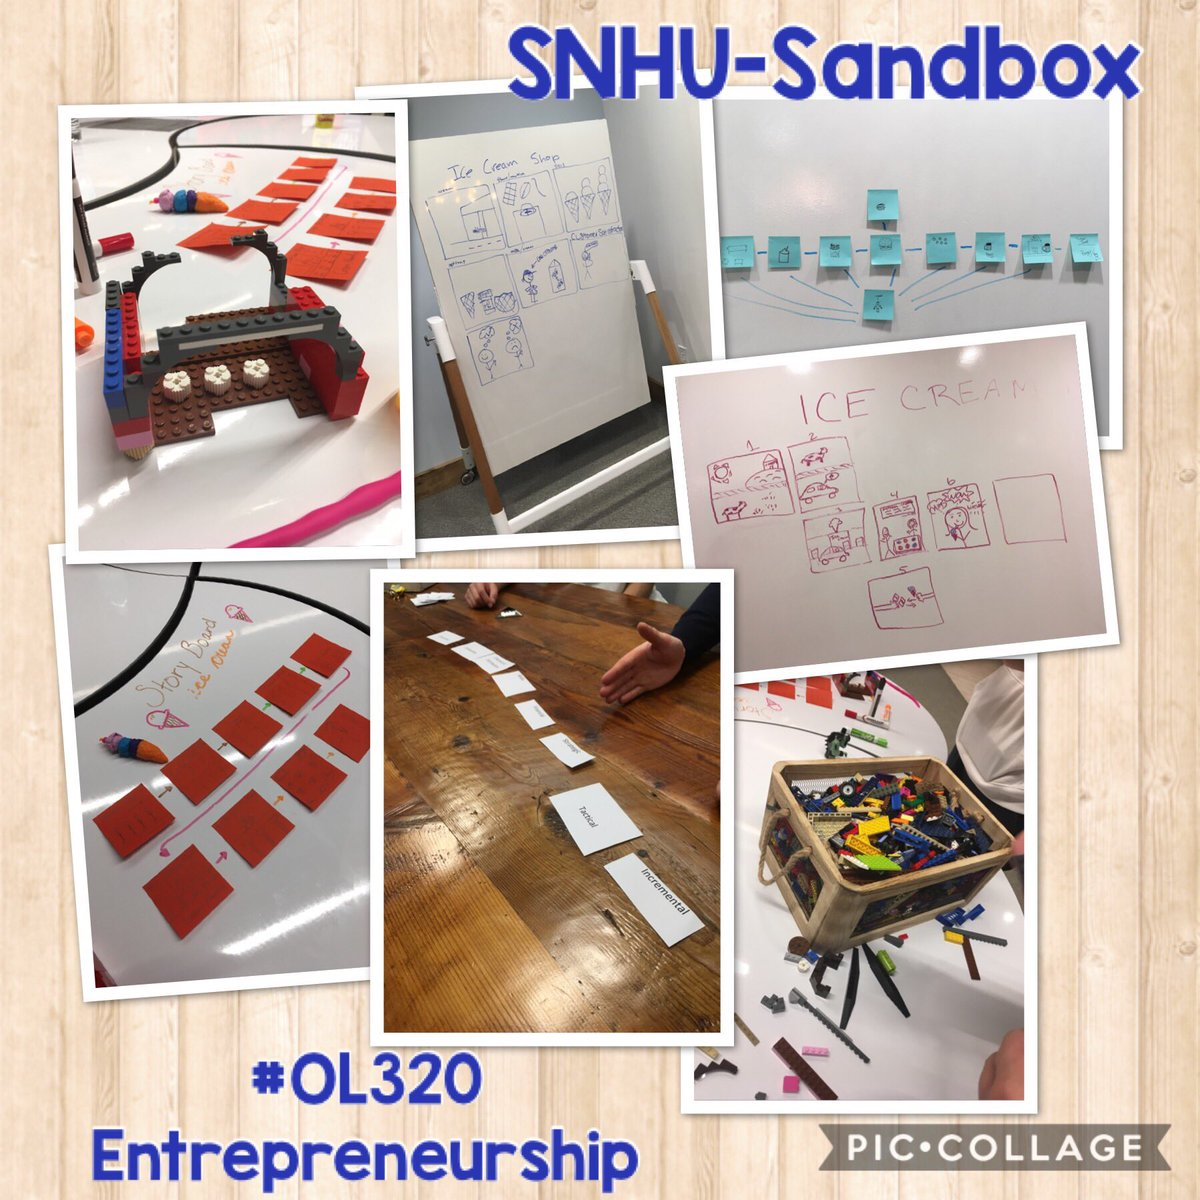 sandboxcollaborative sandboxsnhu twitter